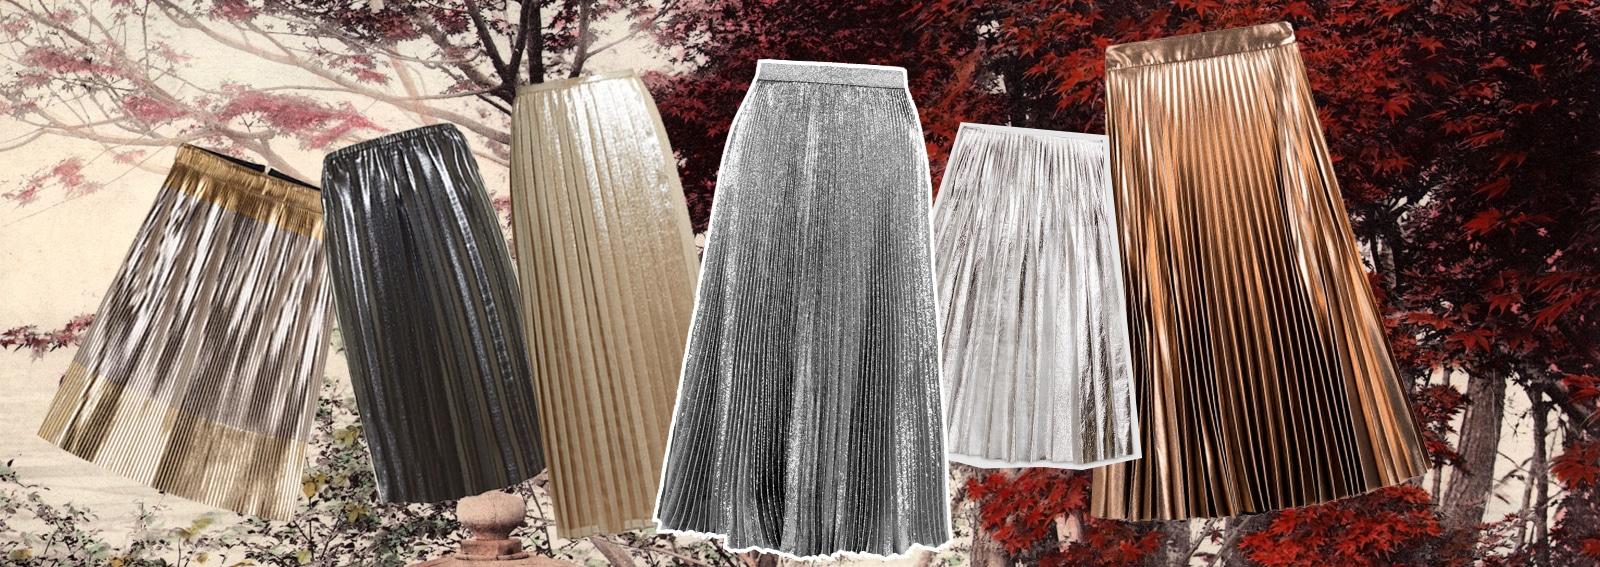 COVER-gonne-metallizzate-DESKTOP